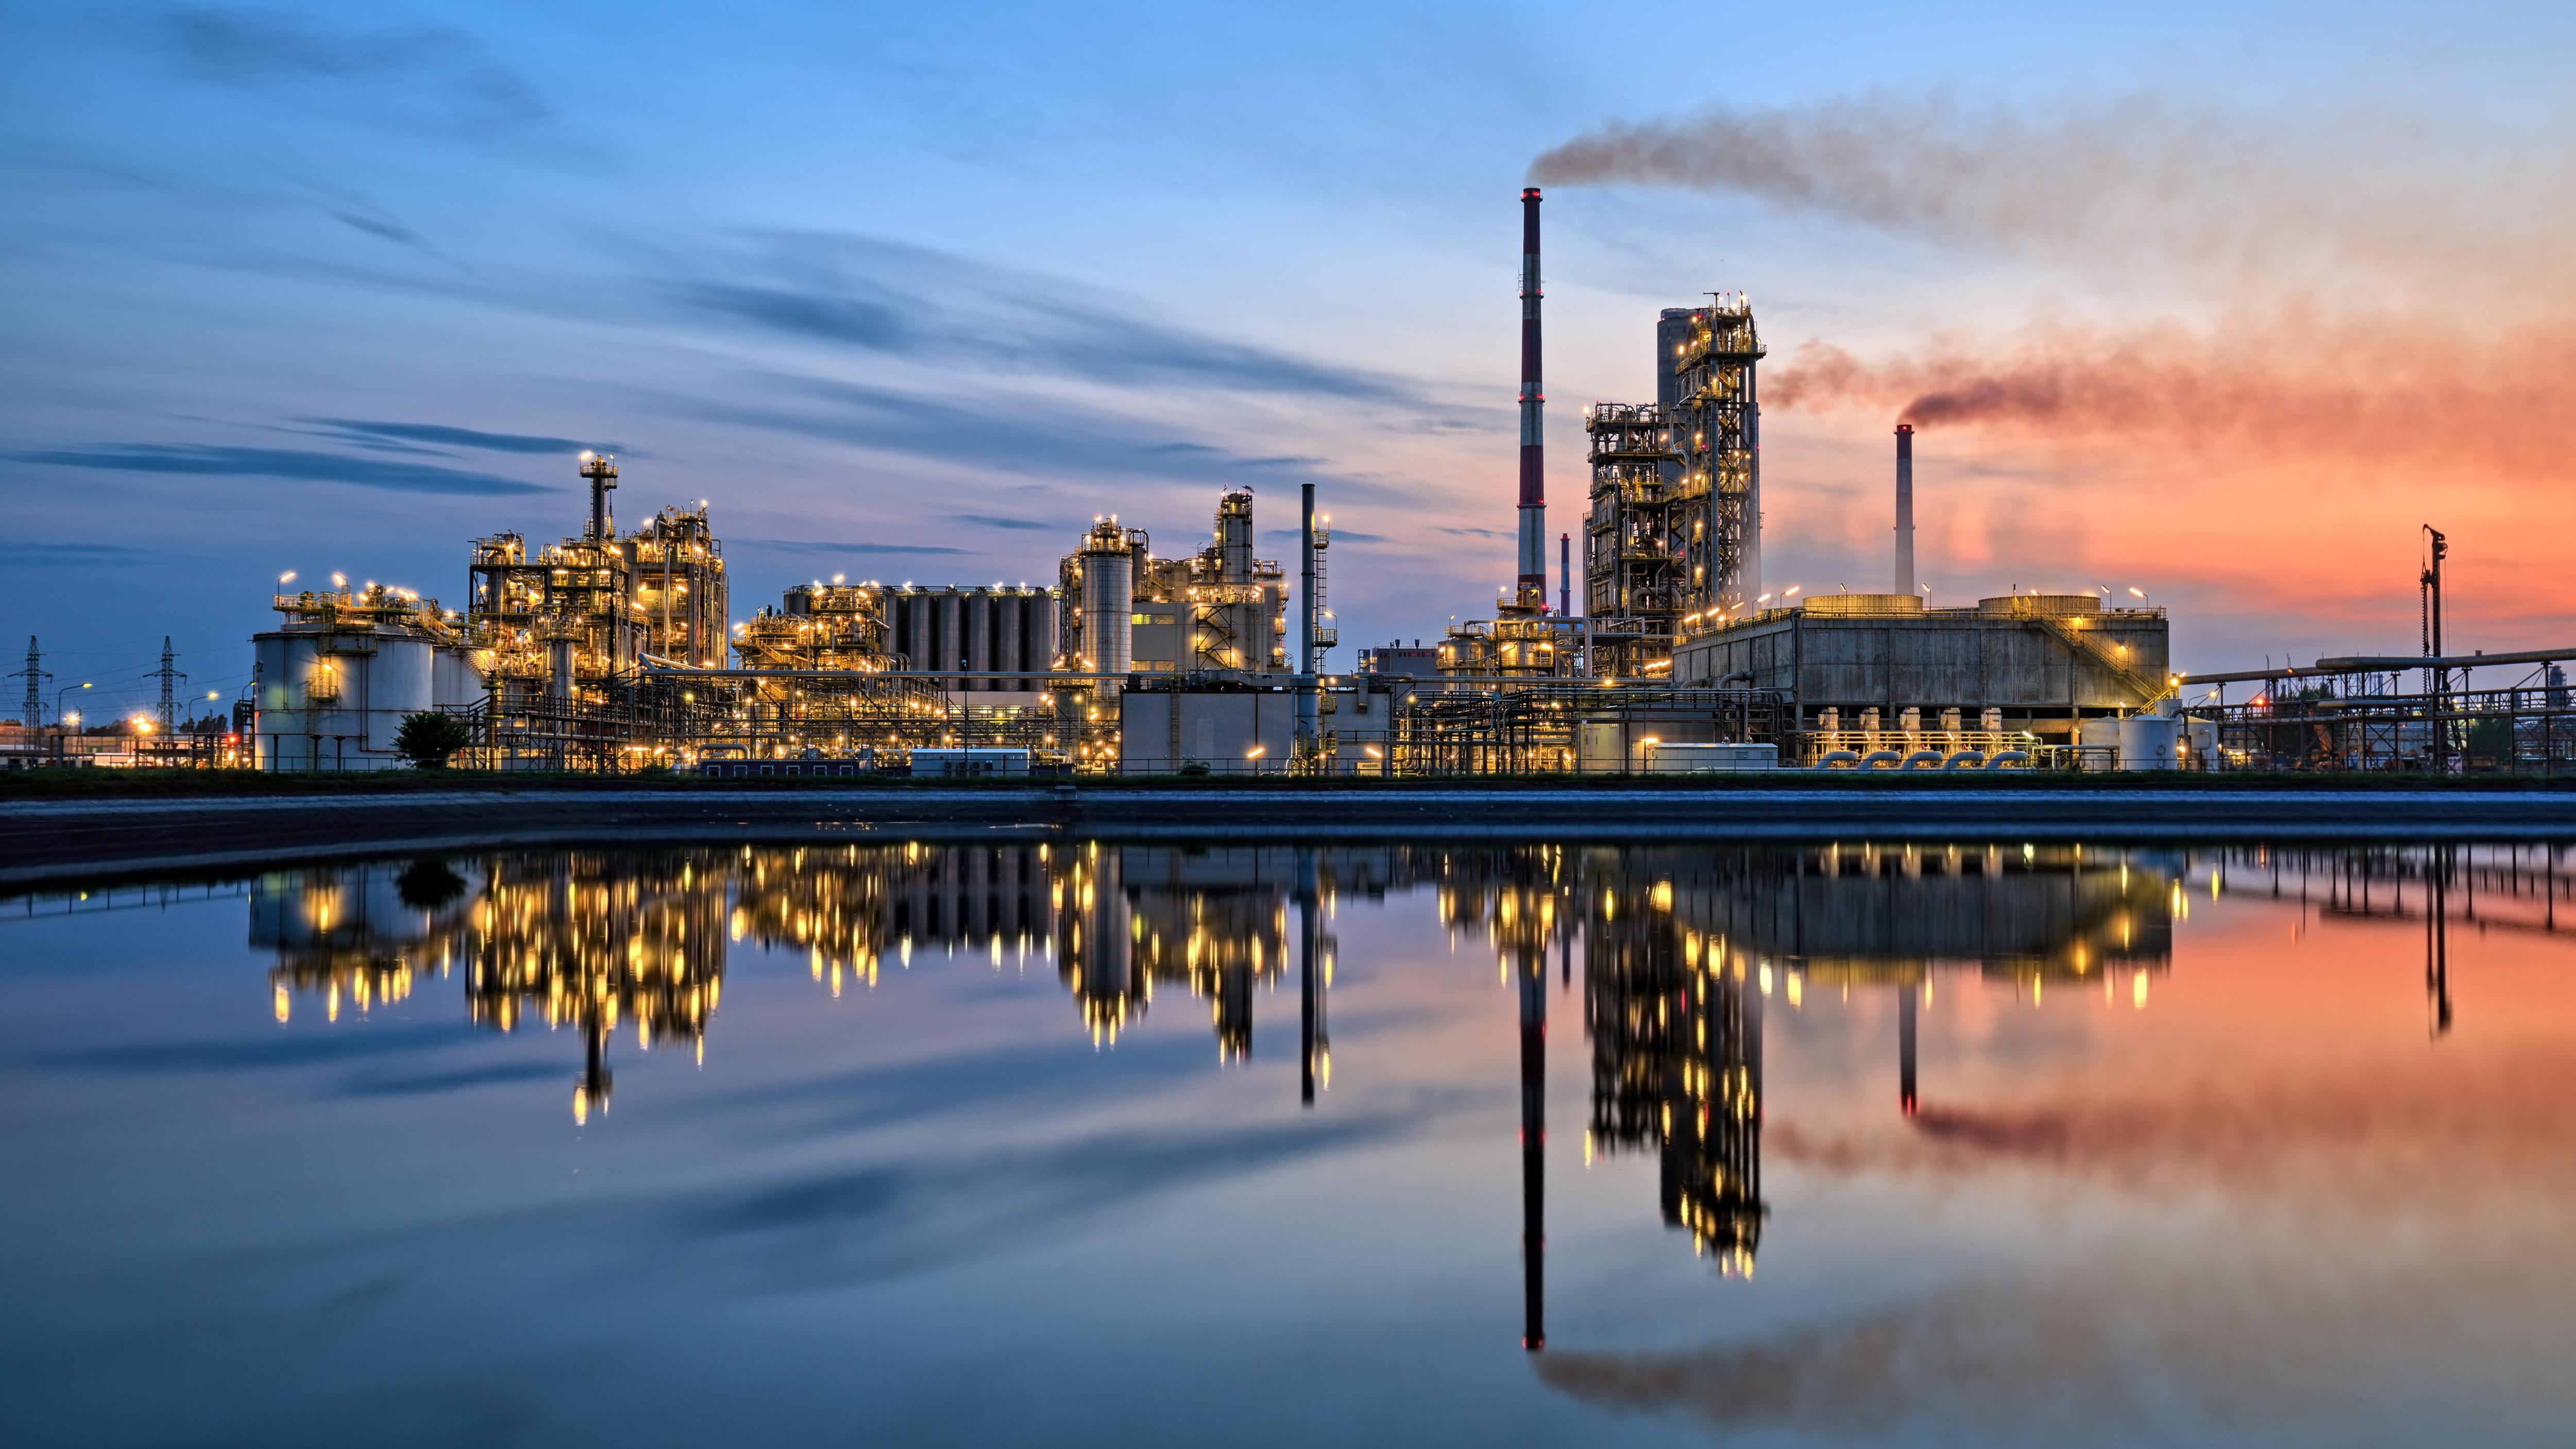 uploads///MPC VLO PSX Marathon Petroleum Valero Phillips  stock